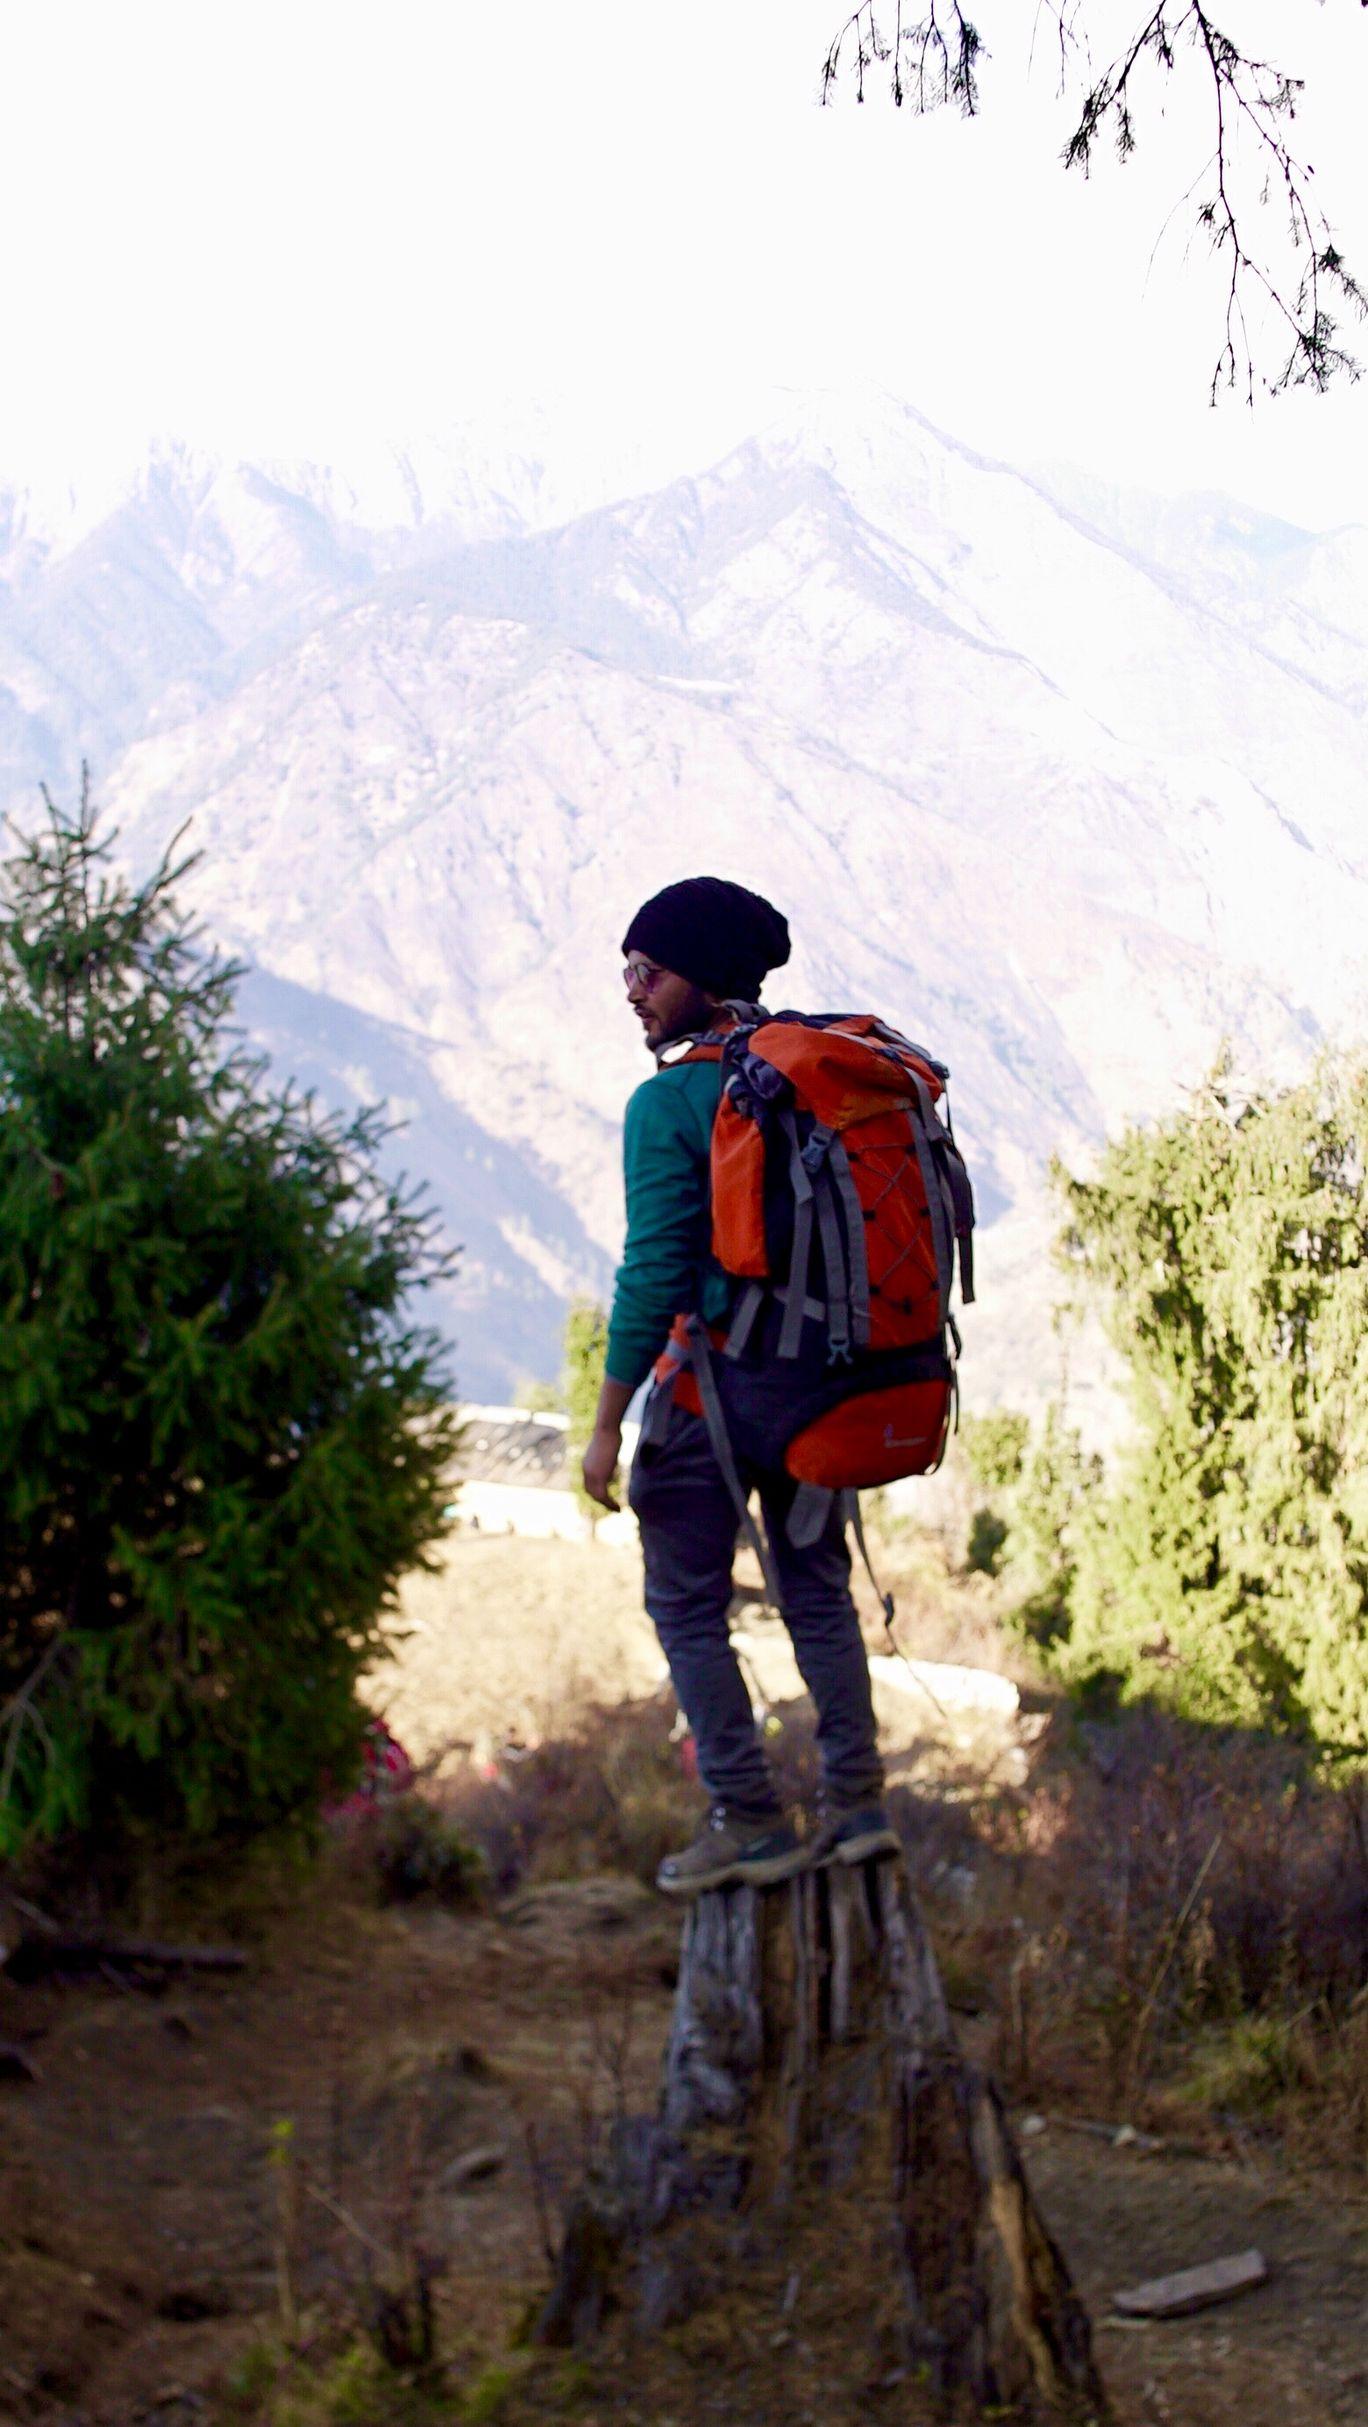 Photo of Uttarakhand By Chatrapal Prajapati